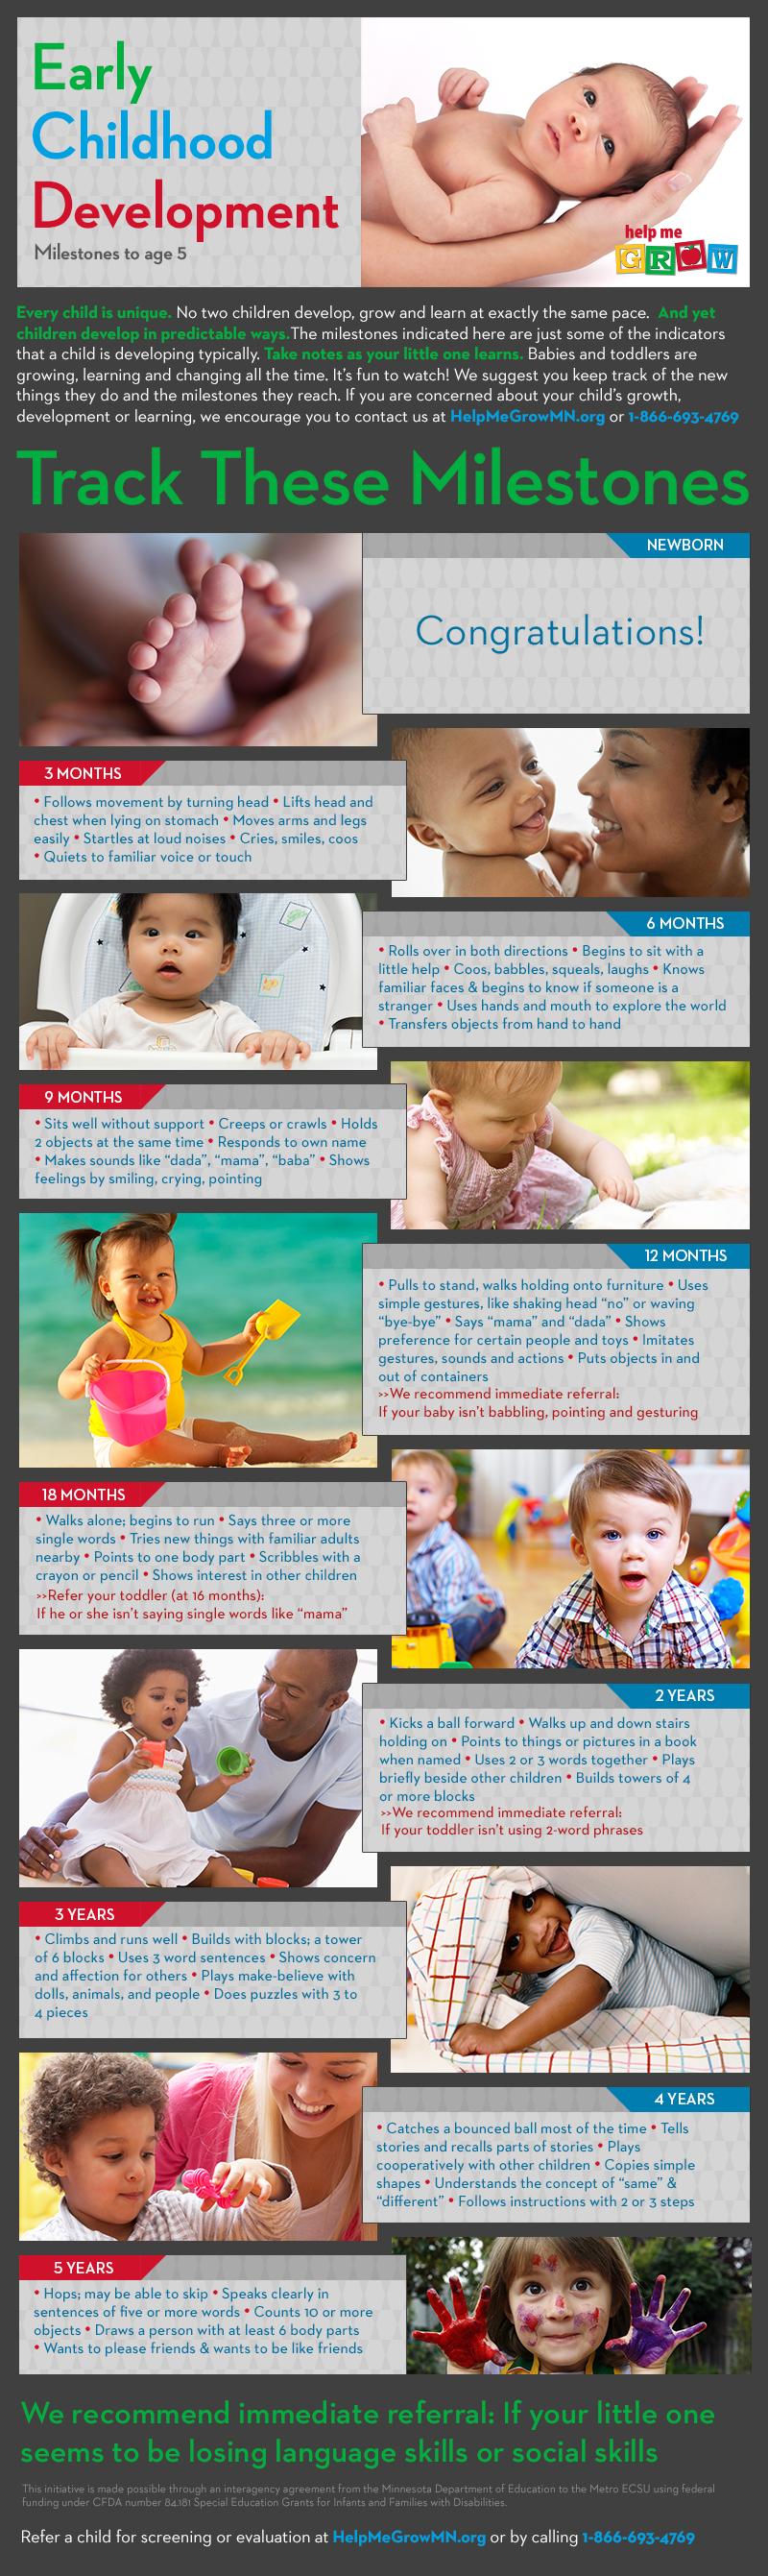 the developmental milestones of a child